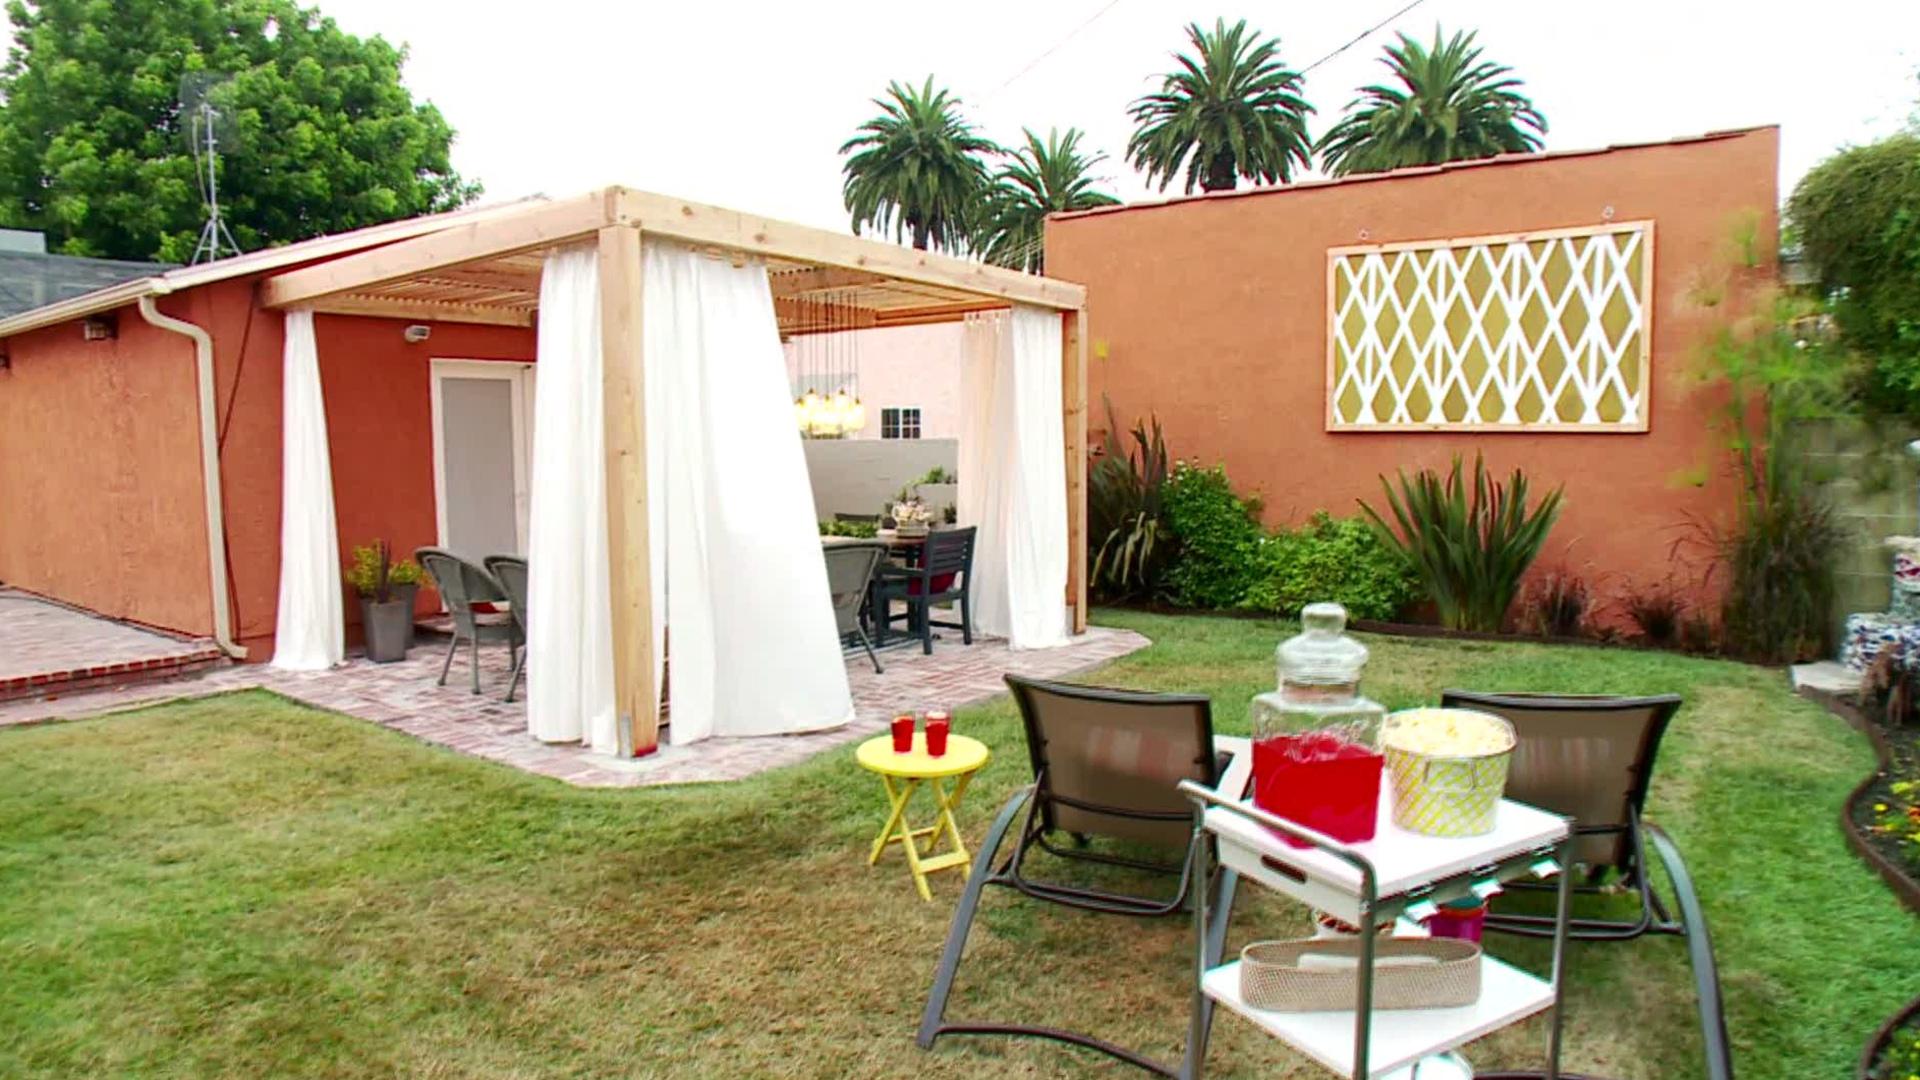 12 Budget-Friendly Backyards - Castel